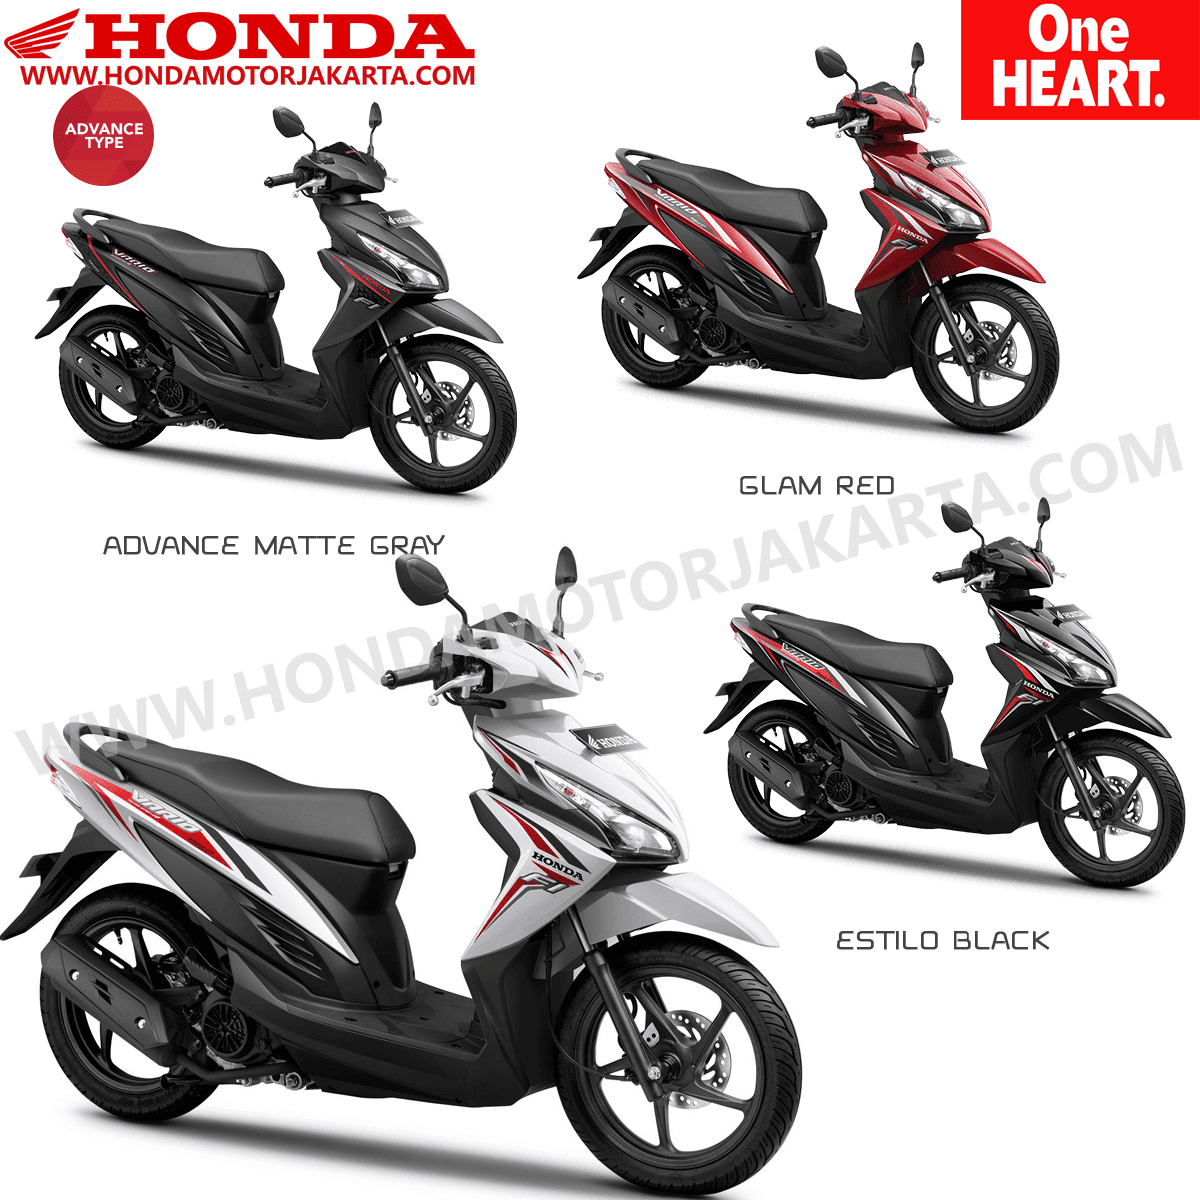 Harga Cicilan Motor Honda Vario 110 New Esp Cbs Glam Red Purbalingga Astra Bima Cw Fi